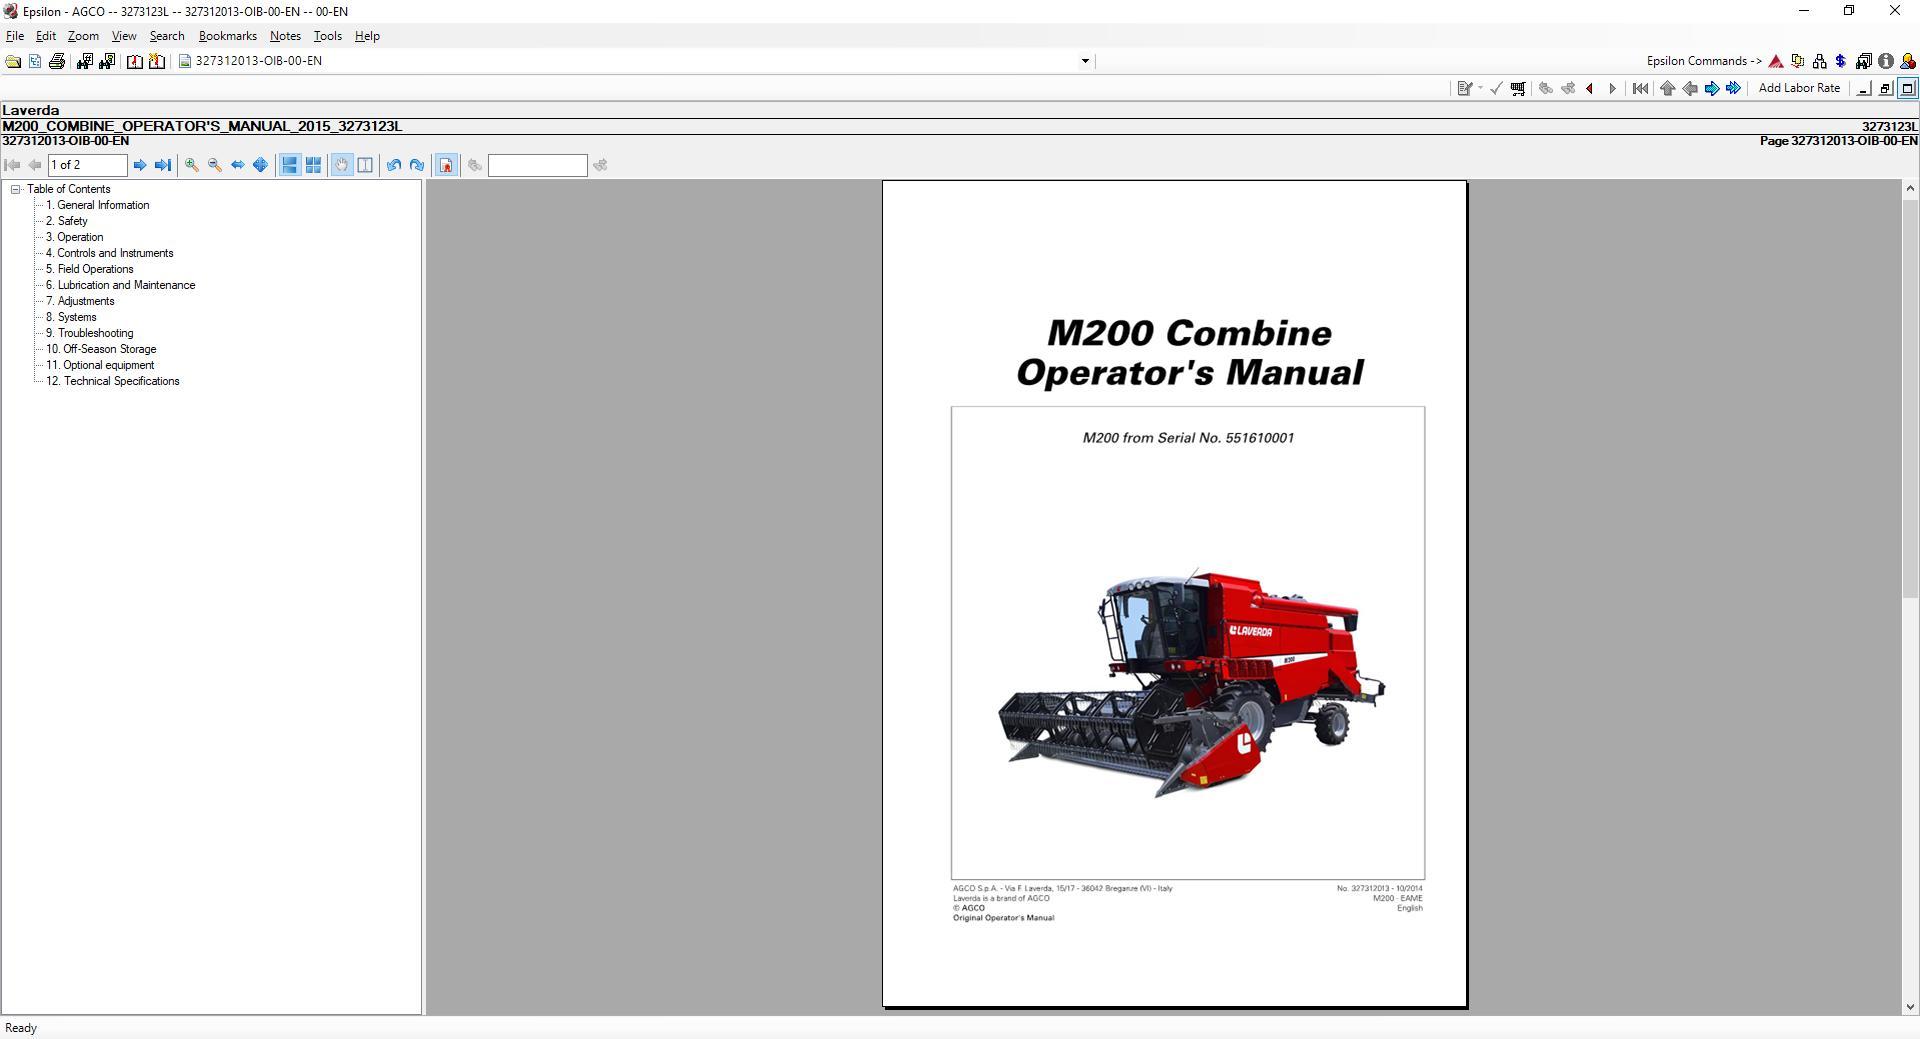 Laverda 2350 LX parts catalog in PDF format